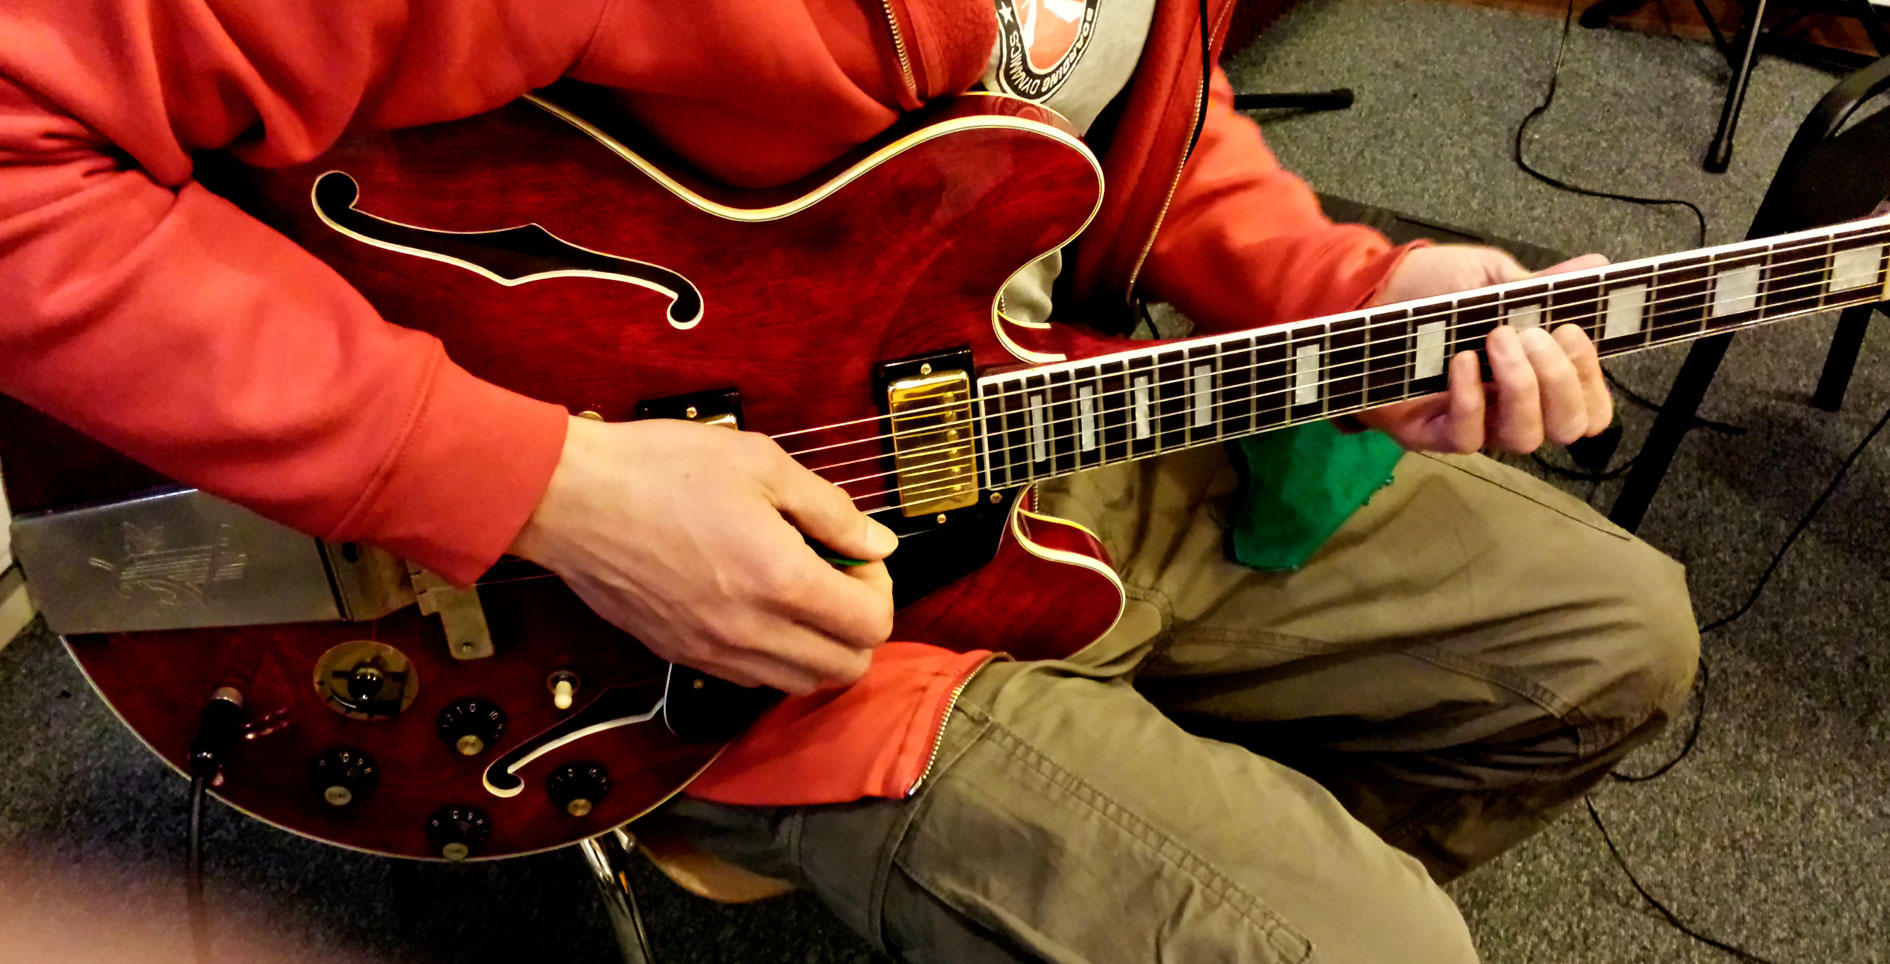 Bertand - Enregistrement guitare pour l'album I'm all right